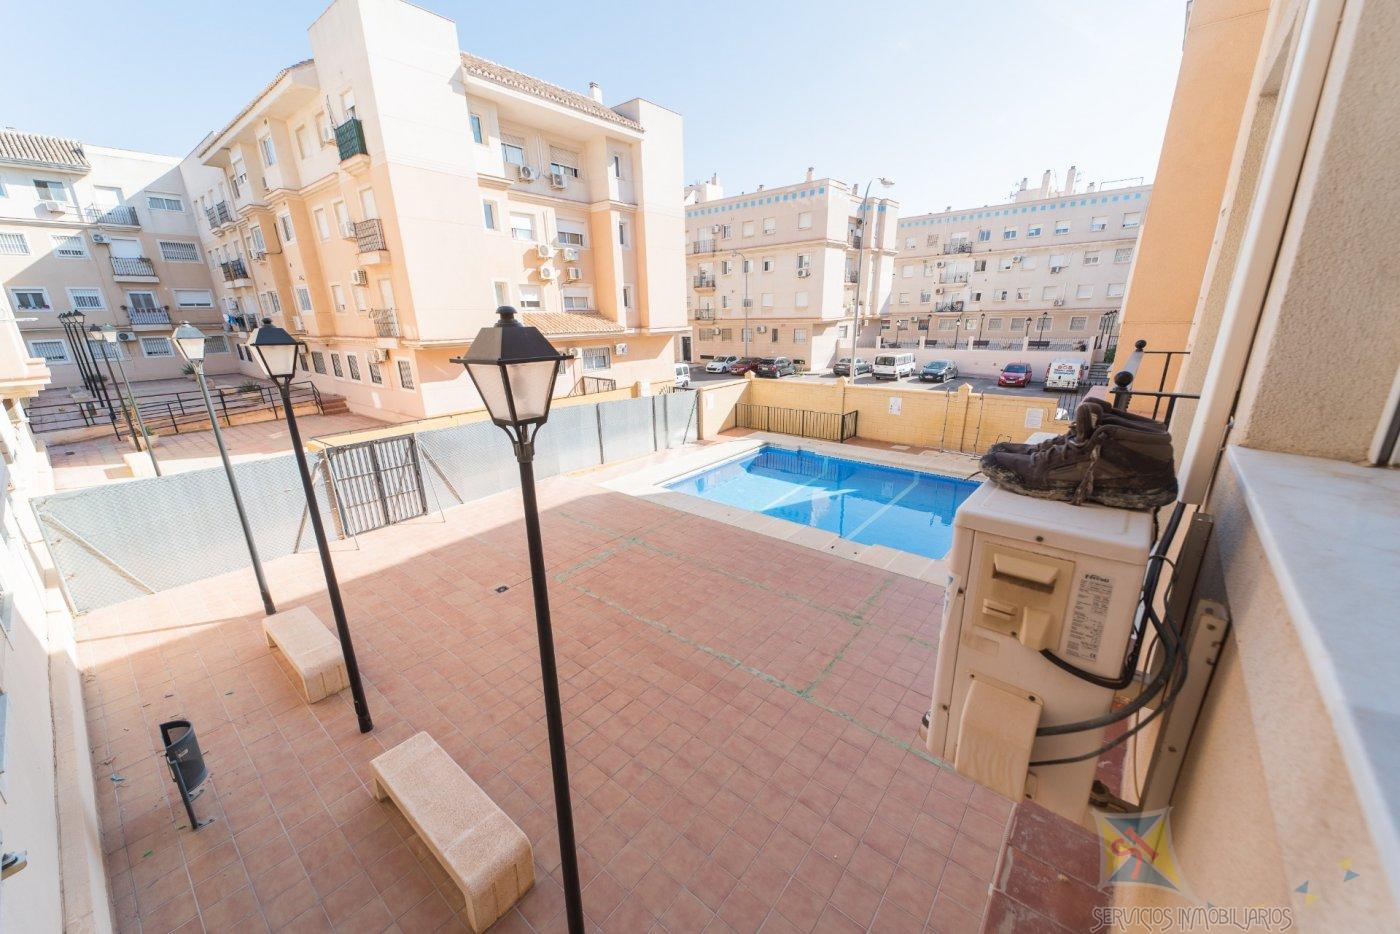 Venta de piso en Huércal de Almería